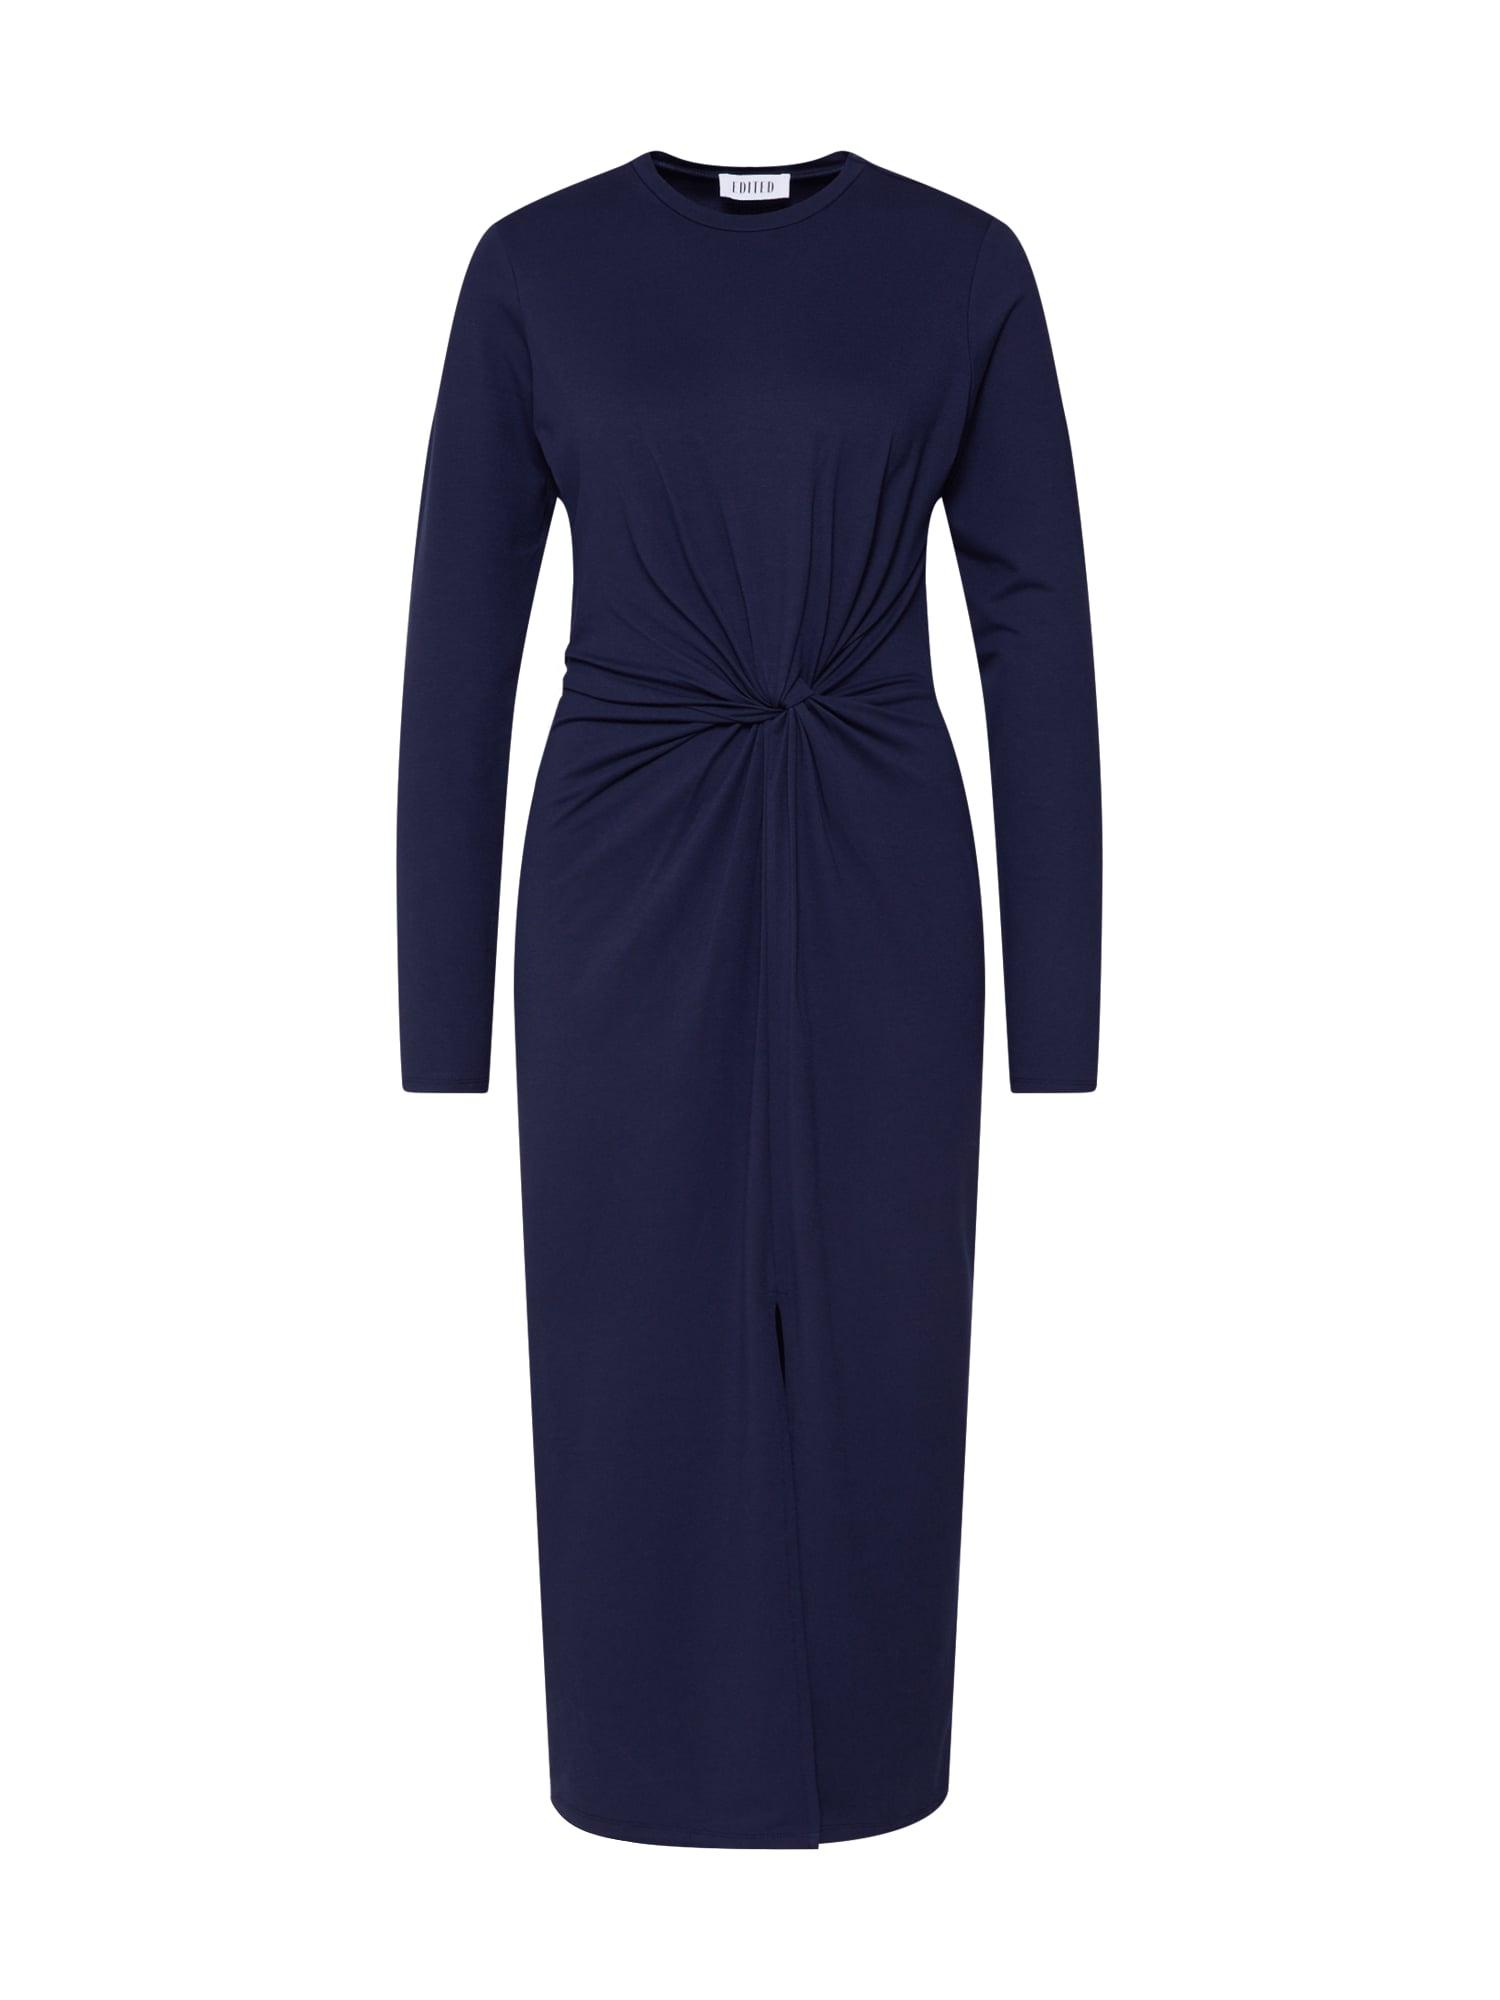 EDITED Suknelė 'Meryl' tamsiai mėlyna